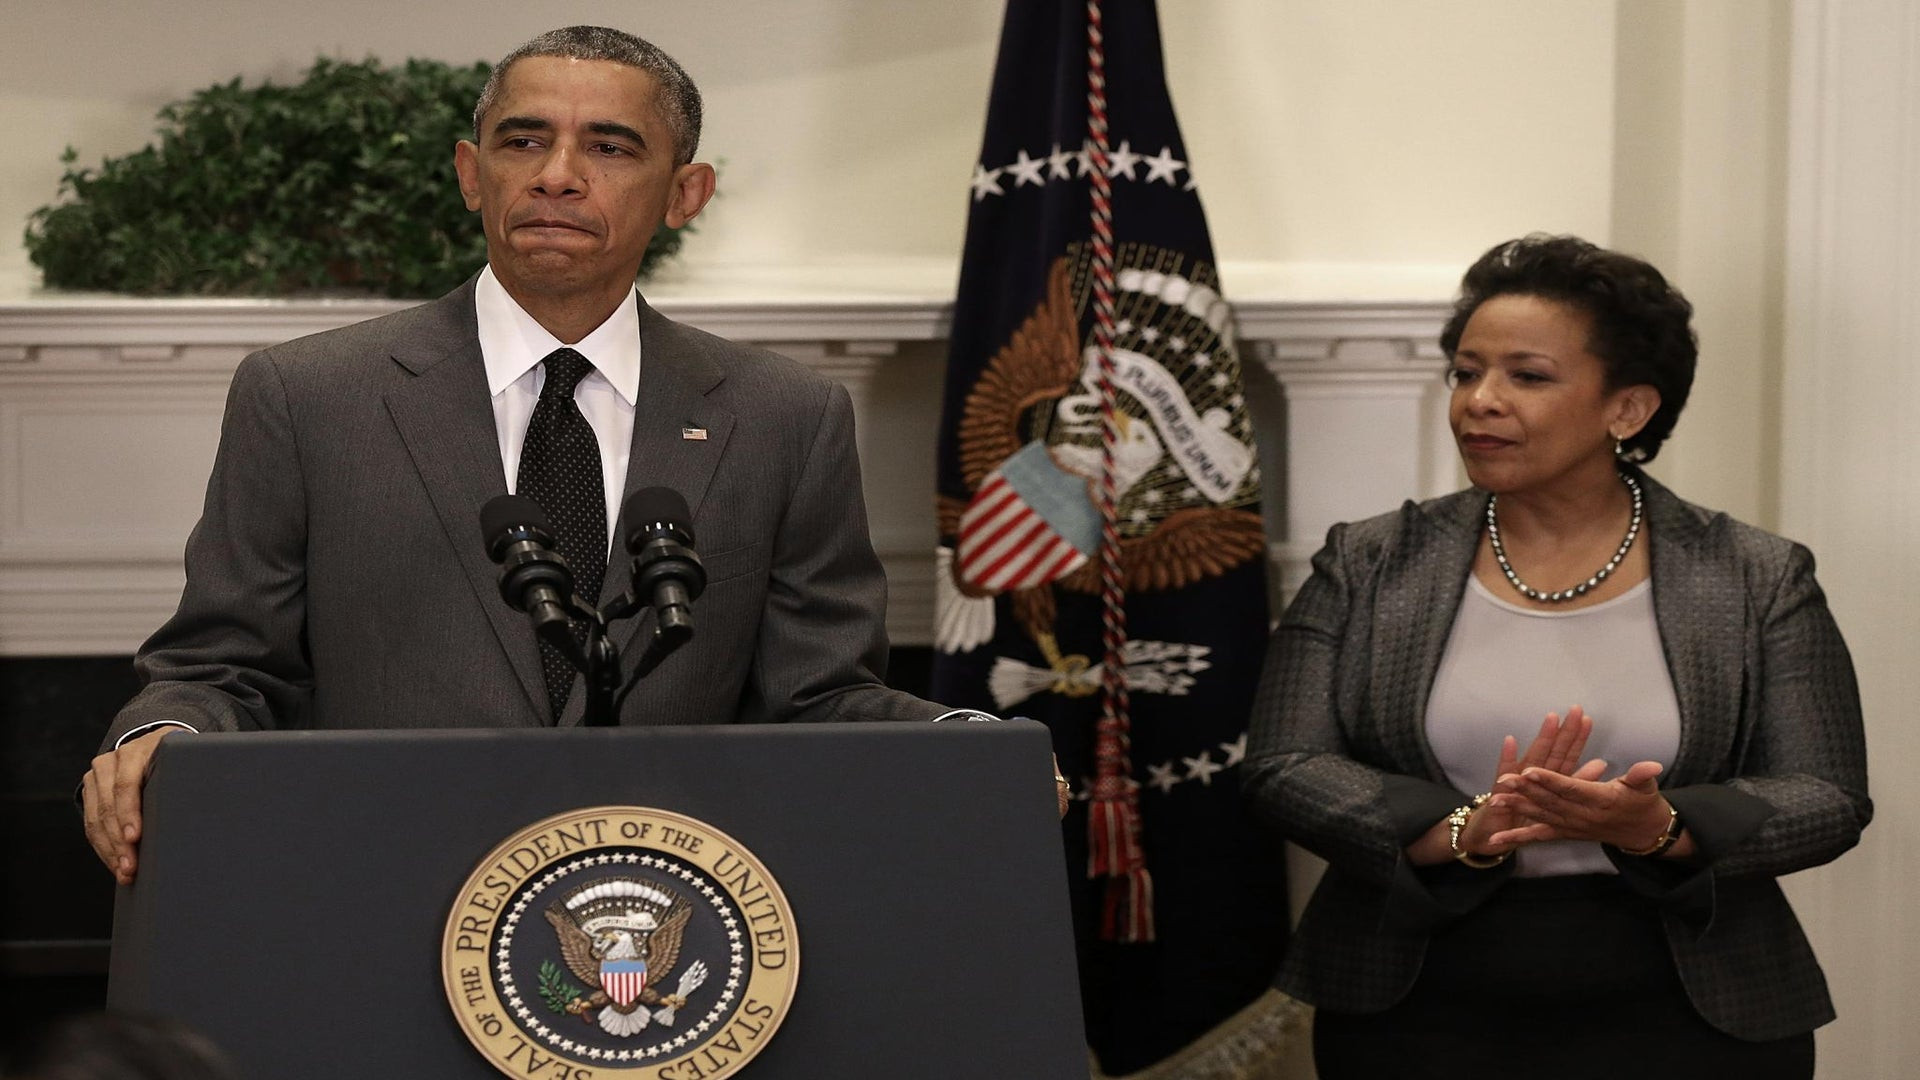 Confirmation Hearings Begin for Attorney General Nominee Loretta Lynch